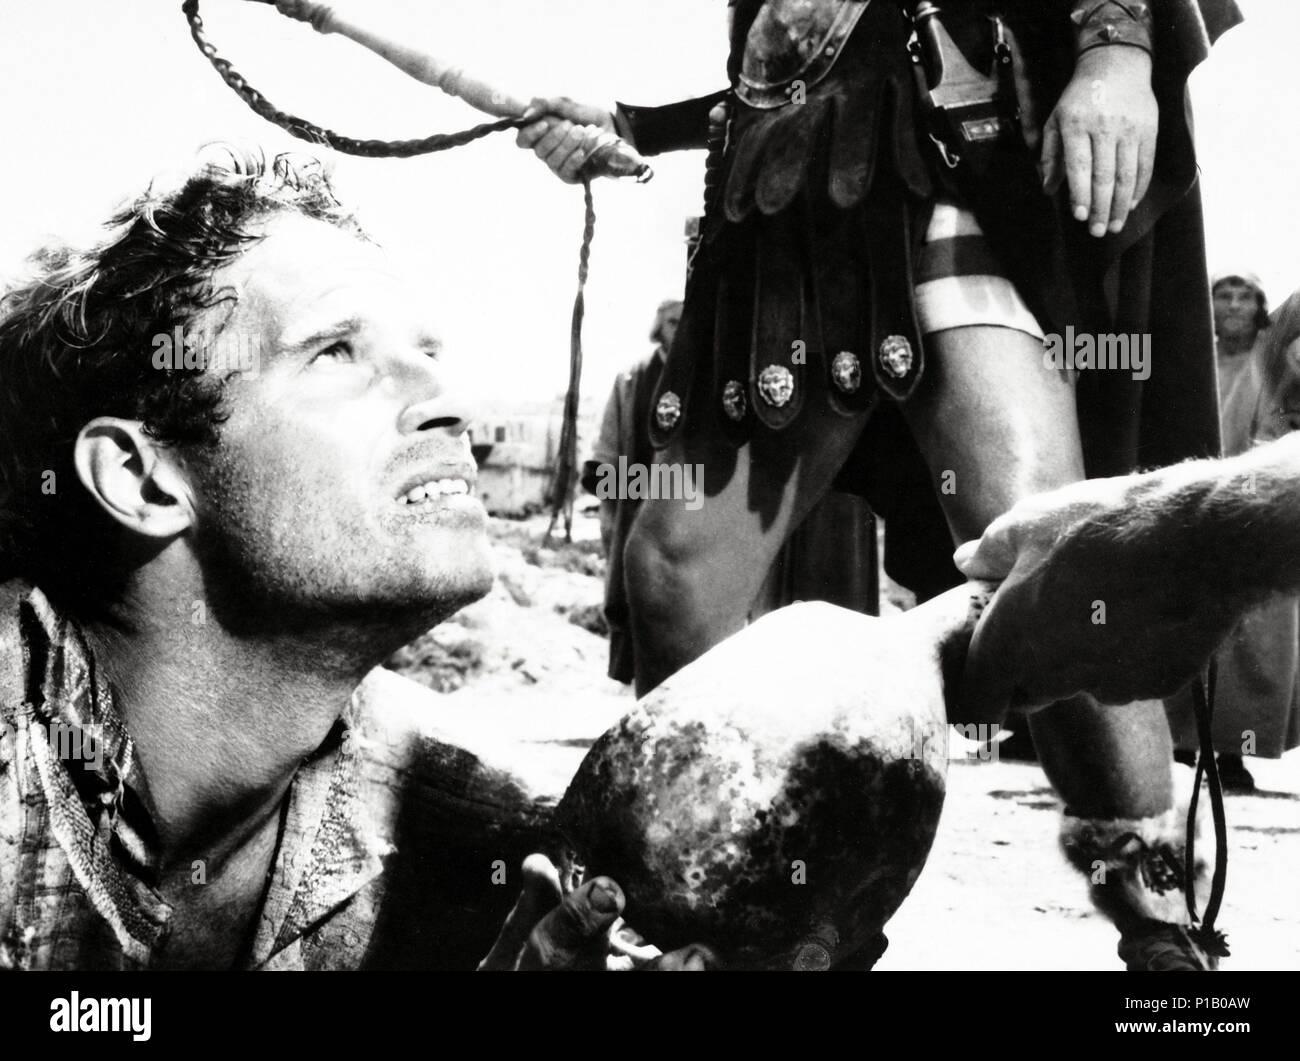 Original Film Title: BEN-HUR.  English Title: BEN-HUR.  Film Director: WILLIAM WYLER.  Year: 1959.  Stars: CHARLTON HESTON. Credit: M.G.M. / Album - Stock Image